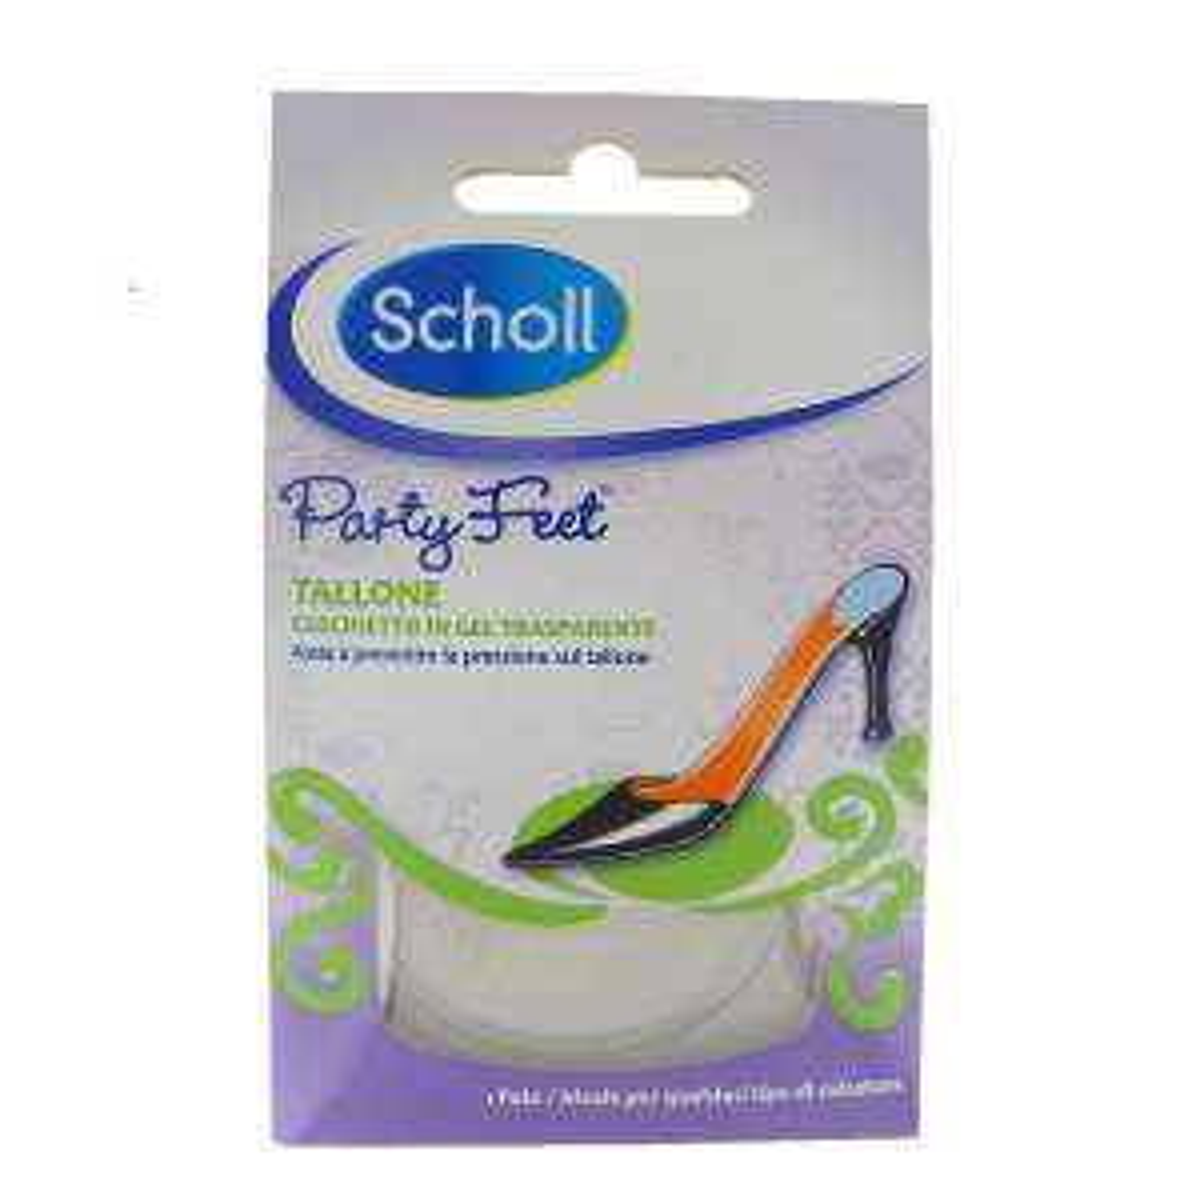 Scholl Party Feet Gel Heel Cushions – 1 Pair 45p with code @ Robert Dyas (Free C&C)